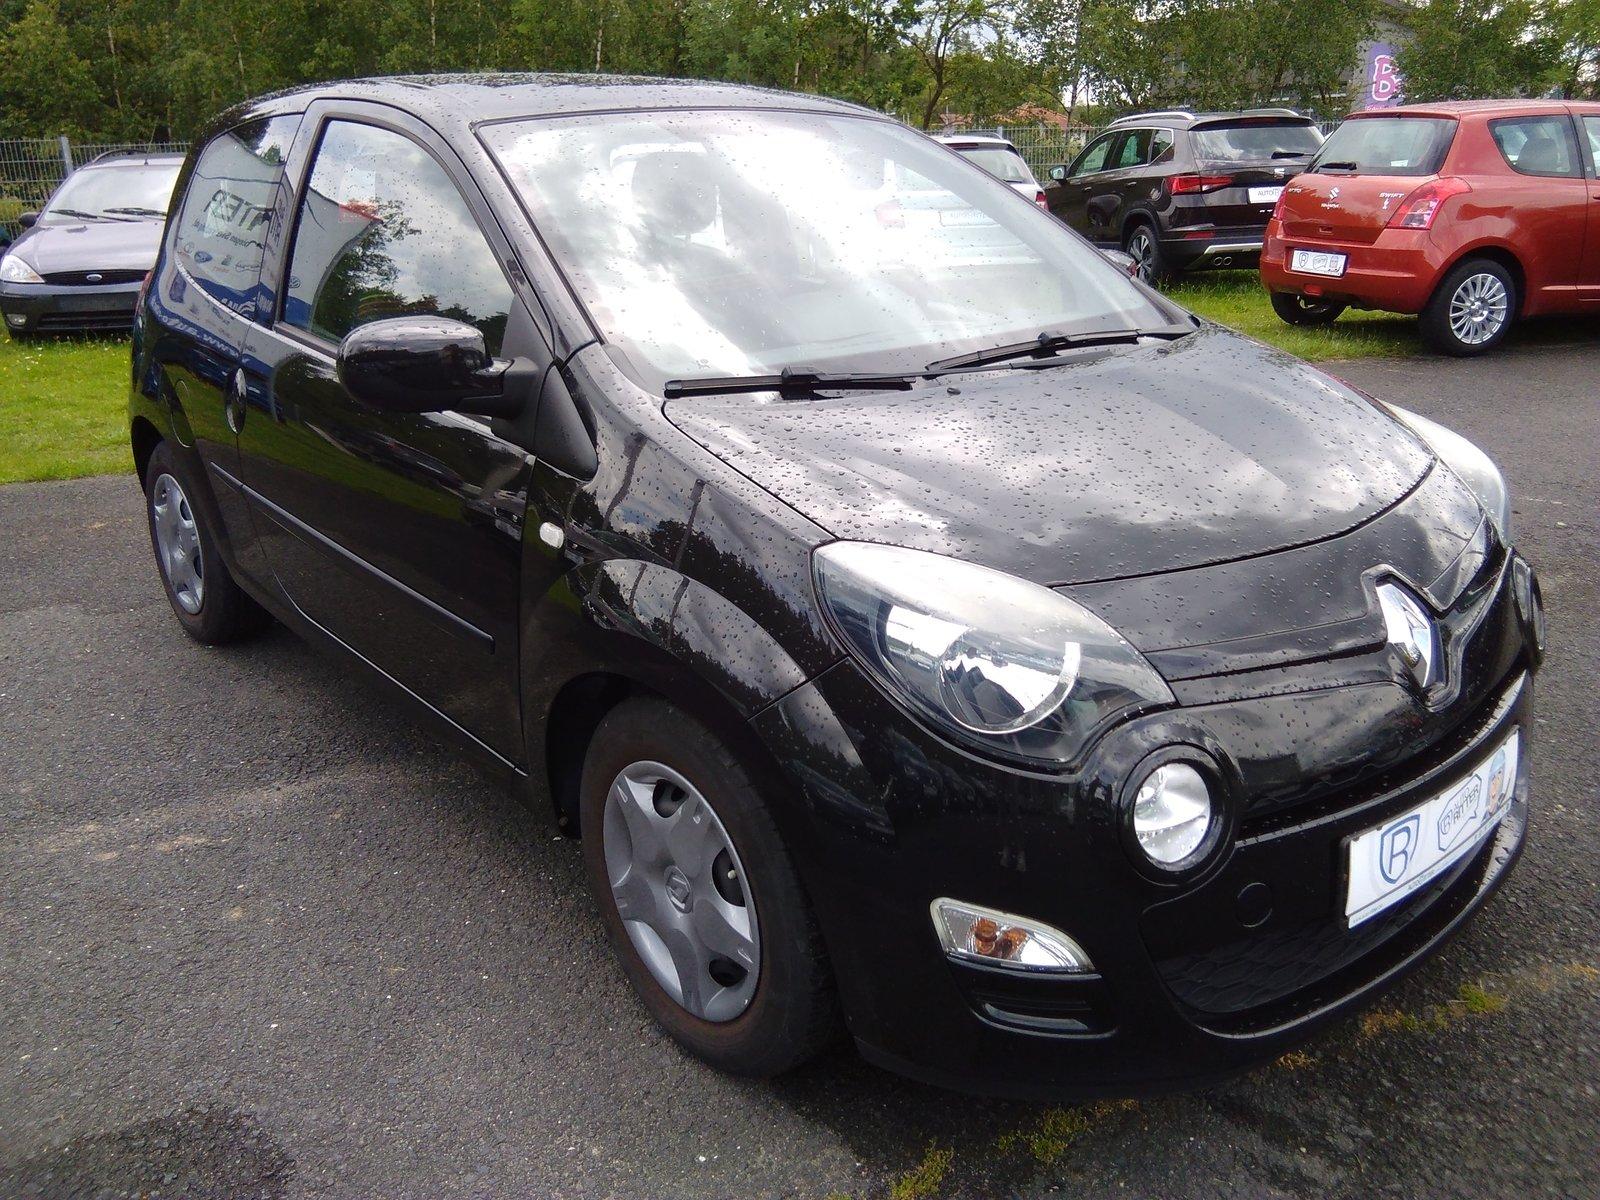 Renault Twingo Paris 1.2 KLIMA|USB|RADIO, Jahr 2013, Benzin